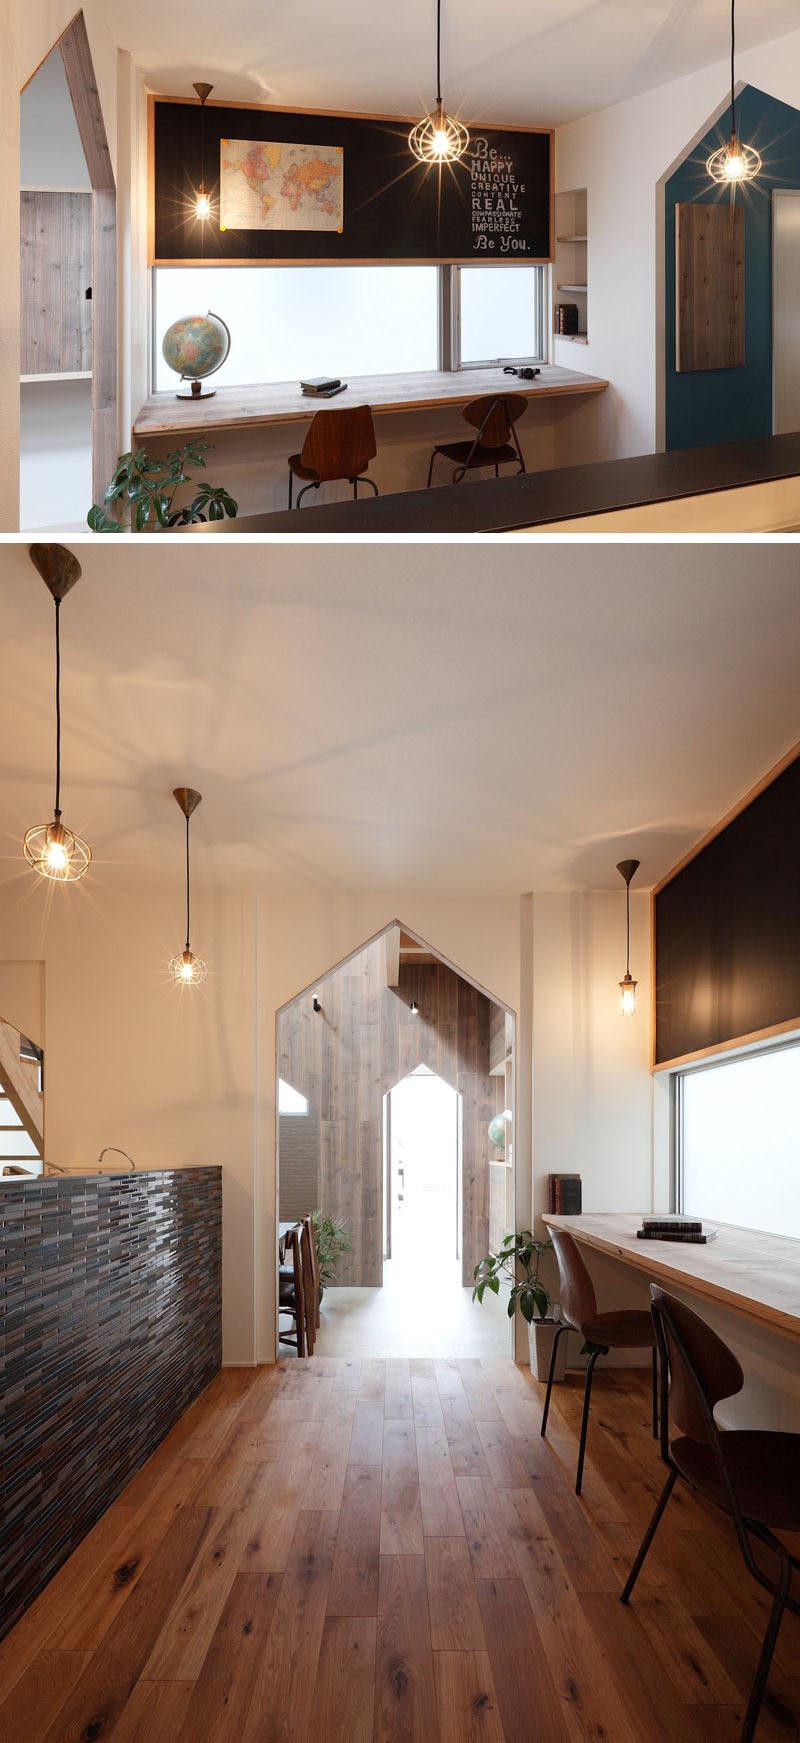 Cool Interior Design Idea 13 Examples Of Desks In Hallways Contemporist Largest Home Design Picture Inspirations Pitcheantrous